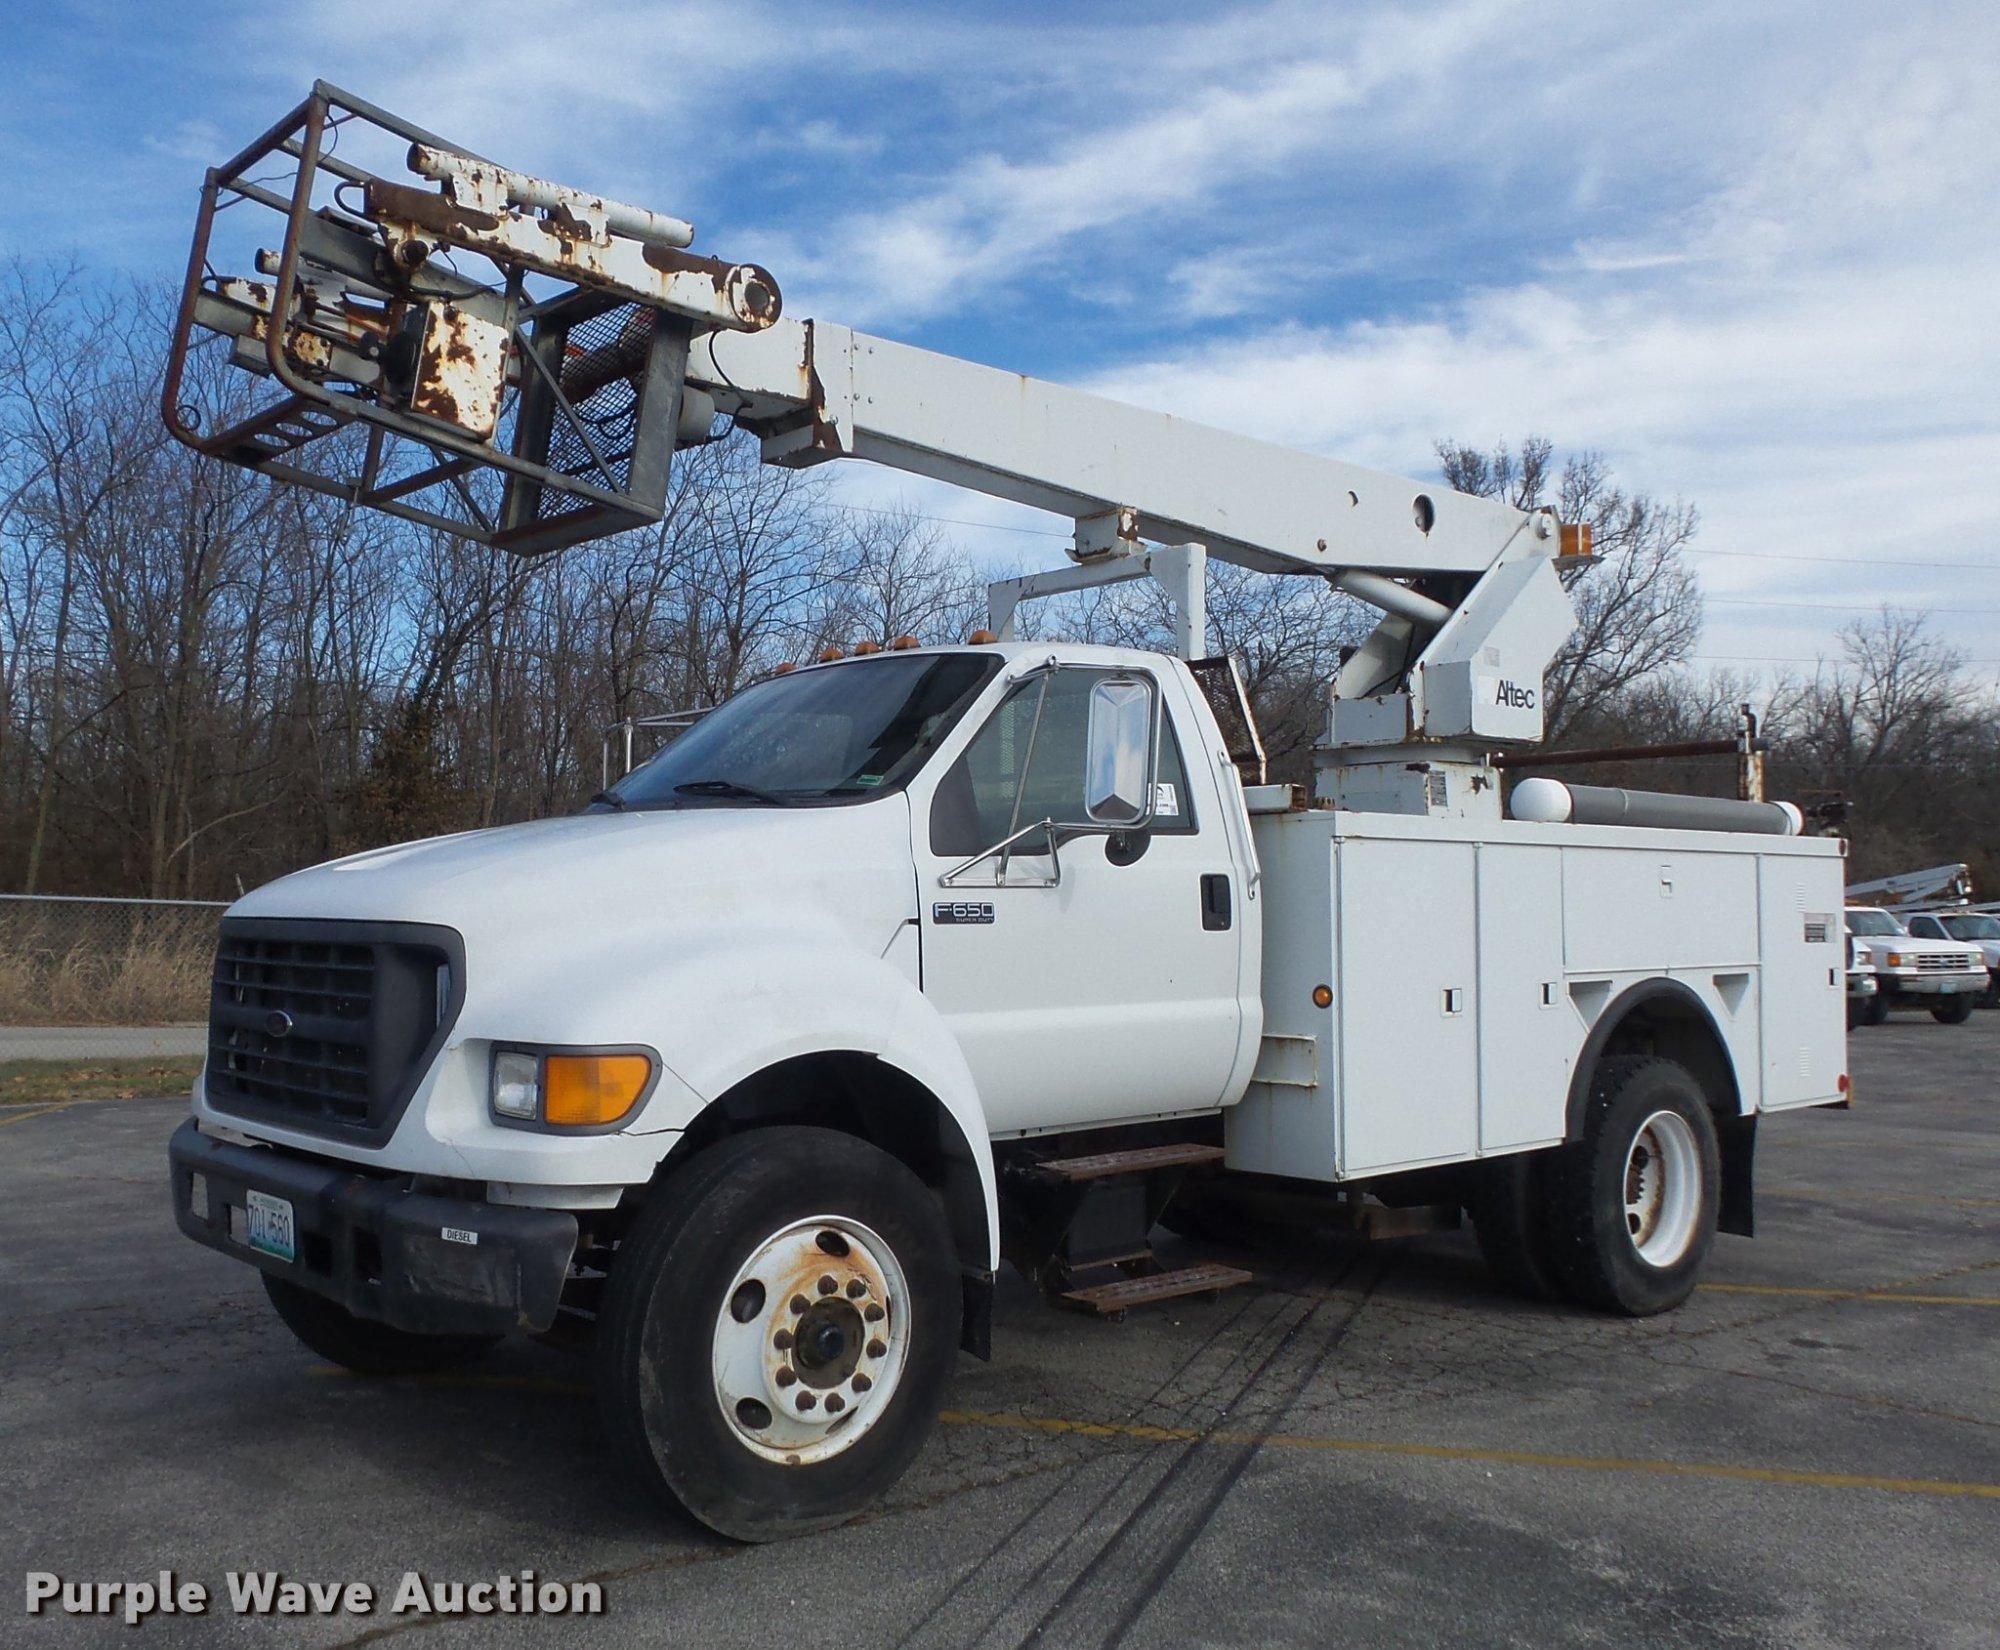 hight resolution of db6269 image for item db6269 2000 ford f650 super duty xl bucket truck